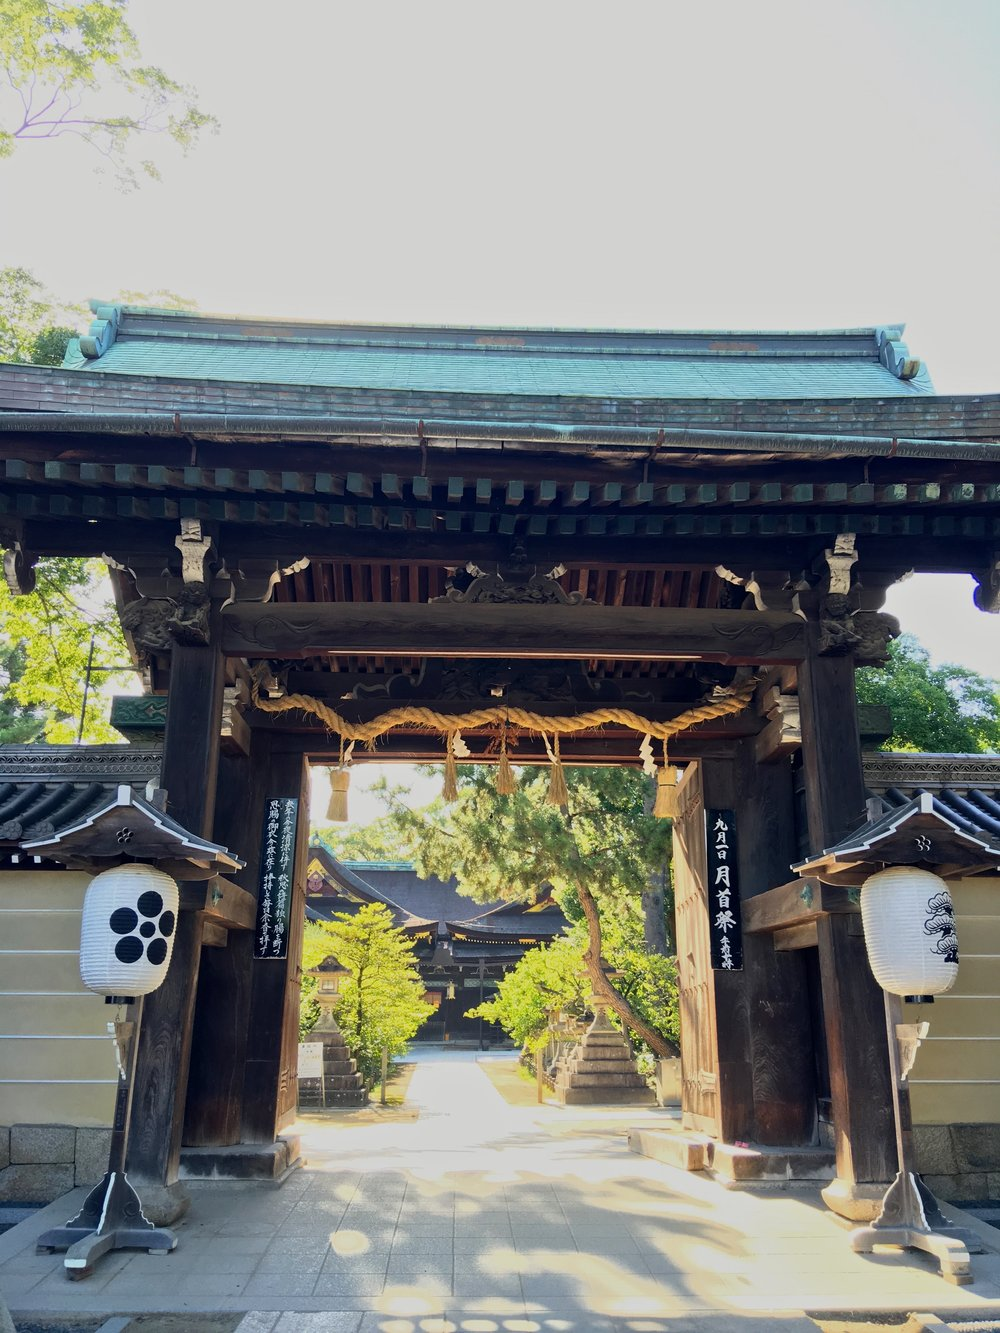 teri_Japan_Kyoto_Shrine_spiritedtable_photo01.jpg